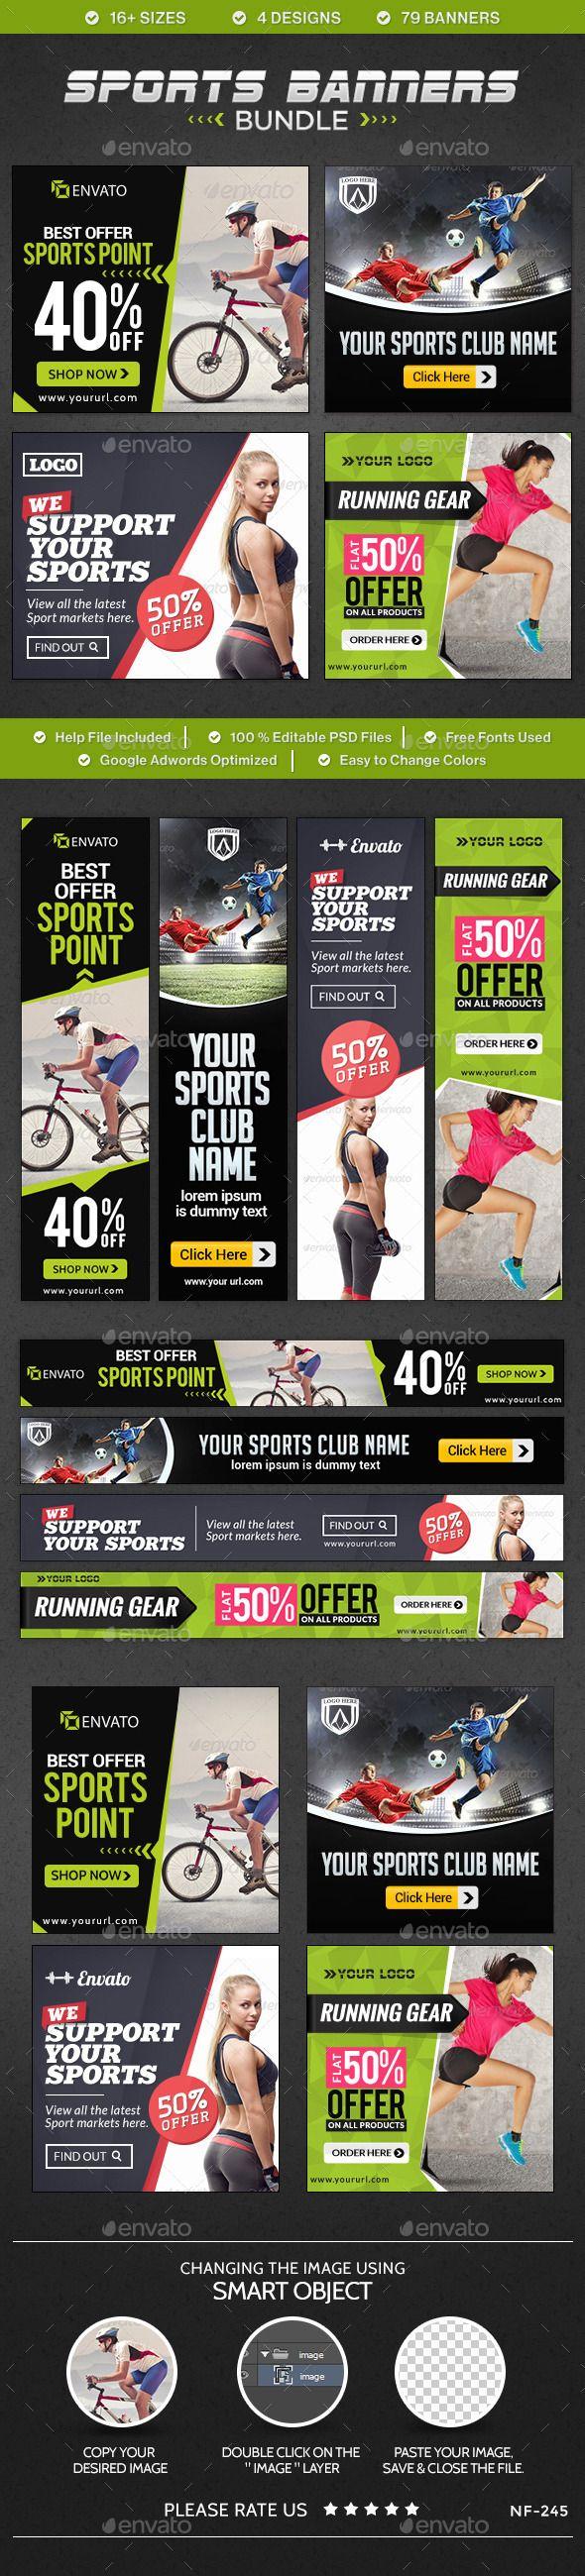 Sports Banners Bundle - 4 sets on Behance